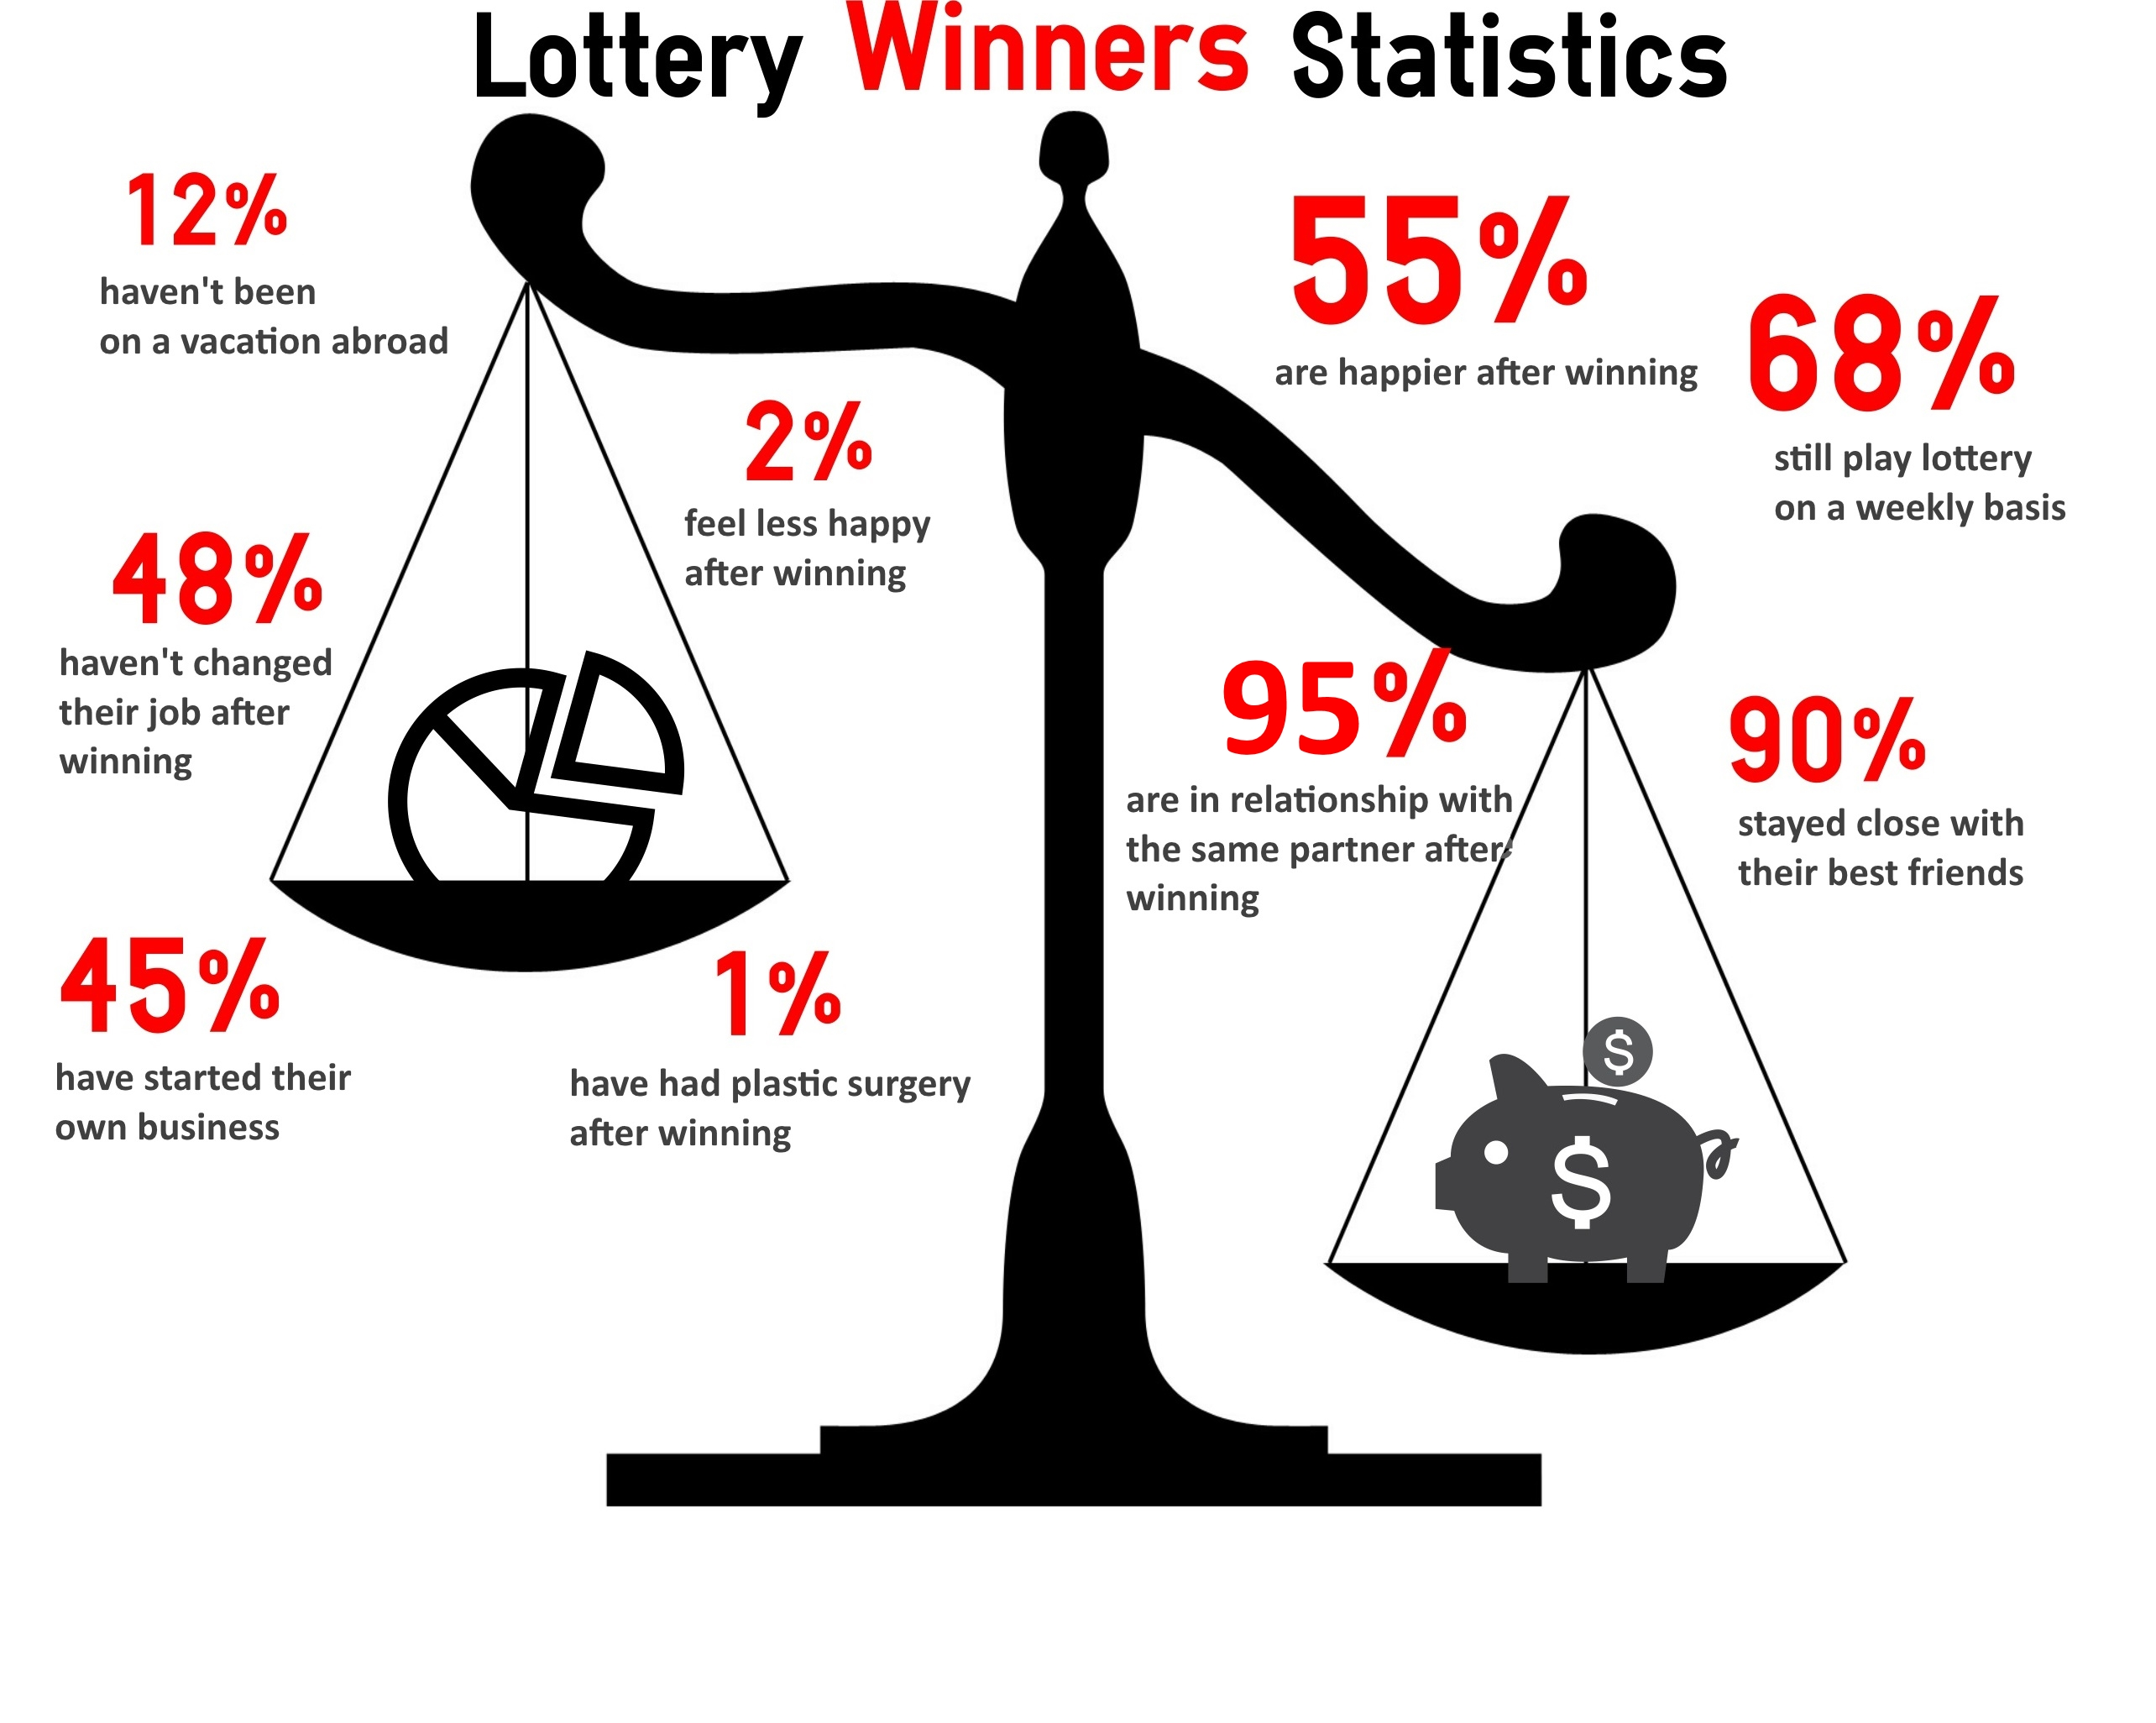 Lottery Winners Statistics